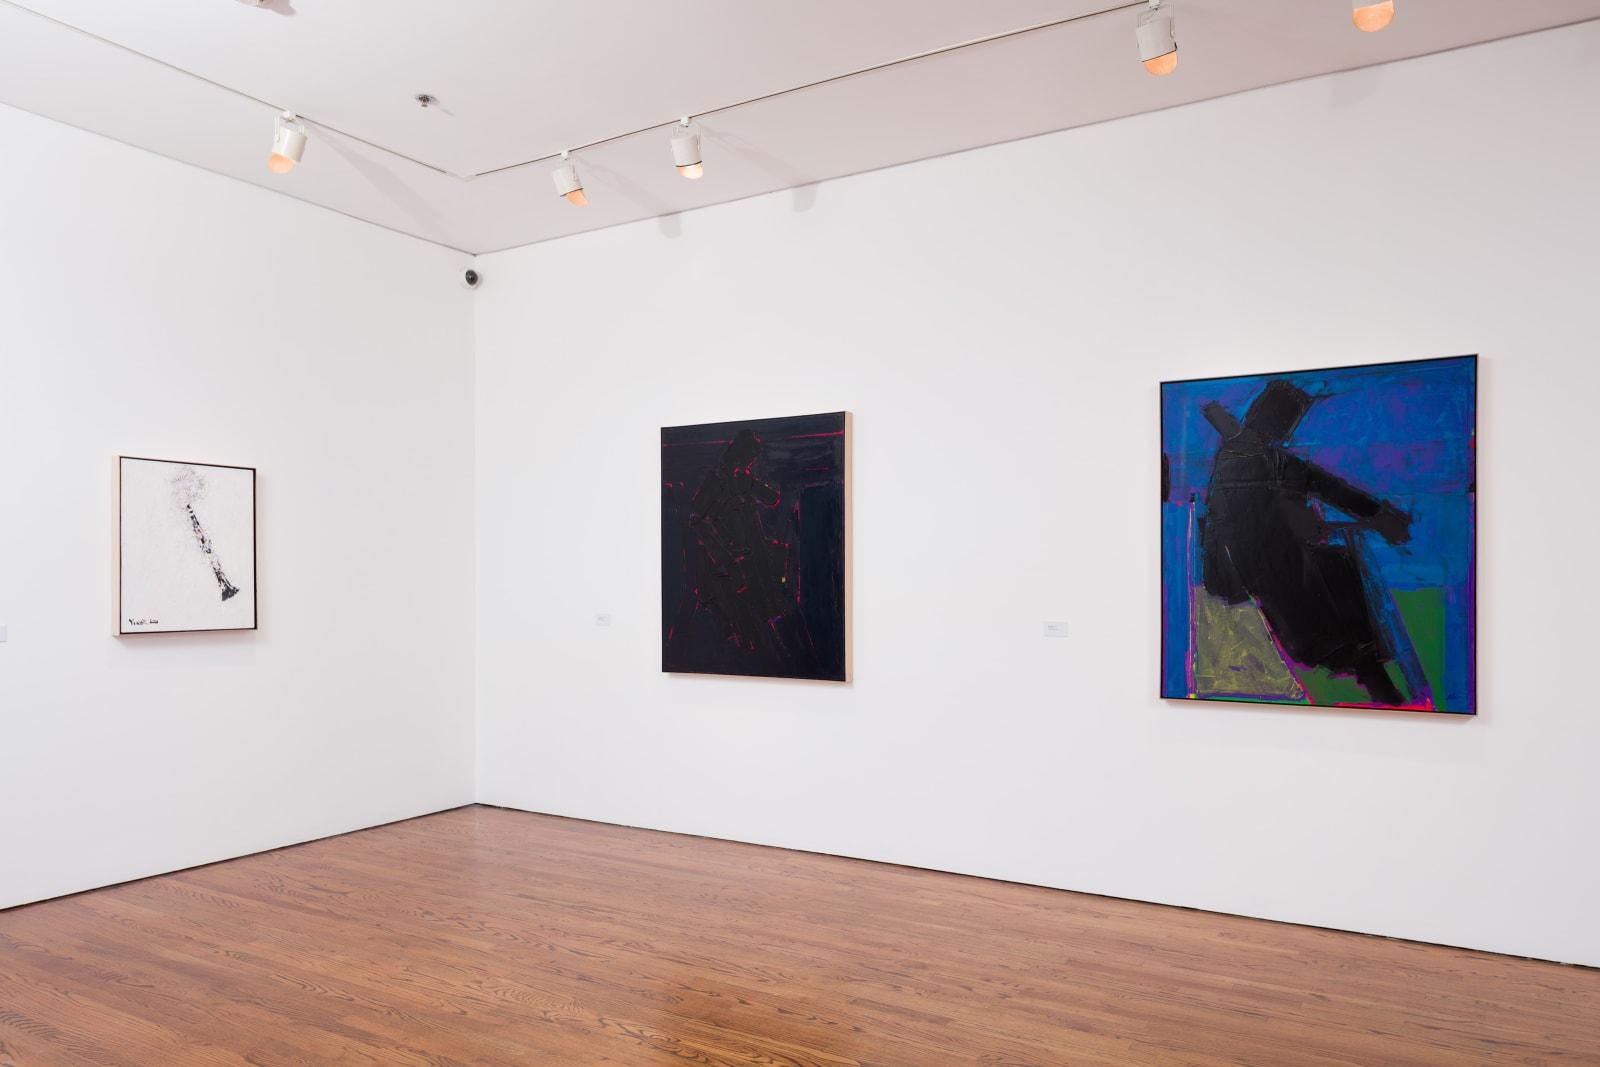 Young-Il Ahn: When Sky Meets Water, 2017, Long Beach Museum of Art, Long Beach, California